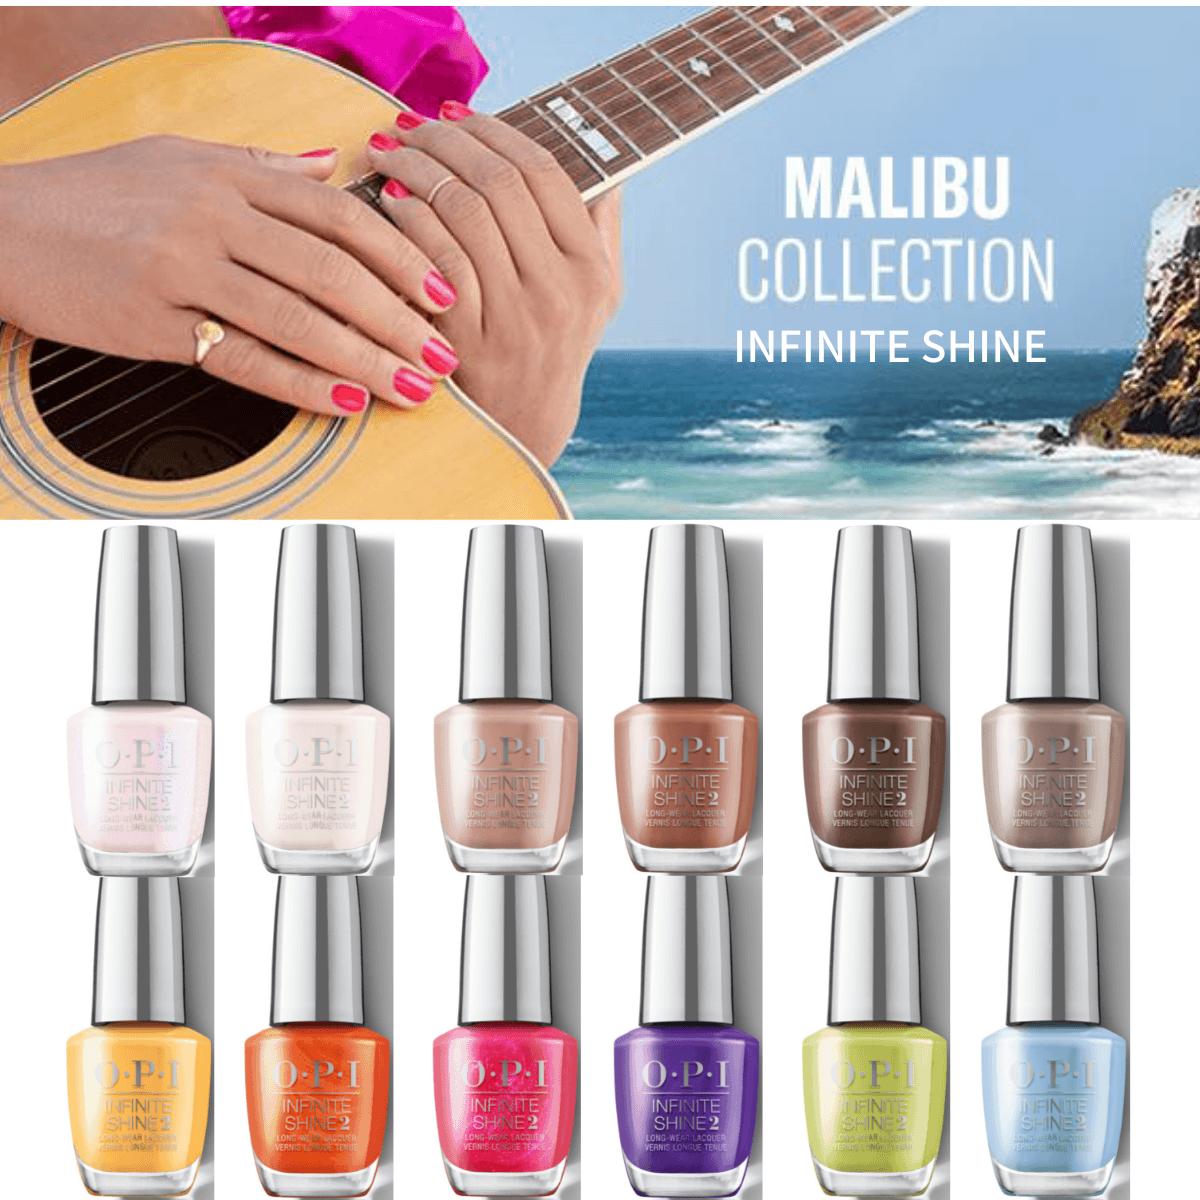 OPI INFINITE SHINE インフィニット シャイン Malibu Collection by OPI オーピーアイ マリブコレクション 15ml ネイルカラー マニキュア 40周年記念 第二弾